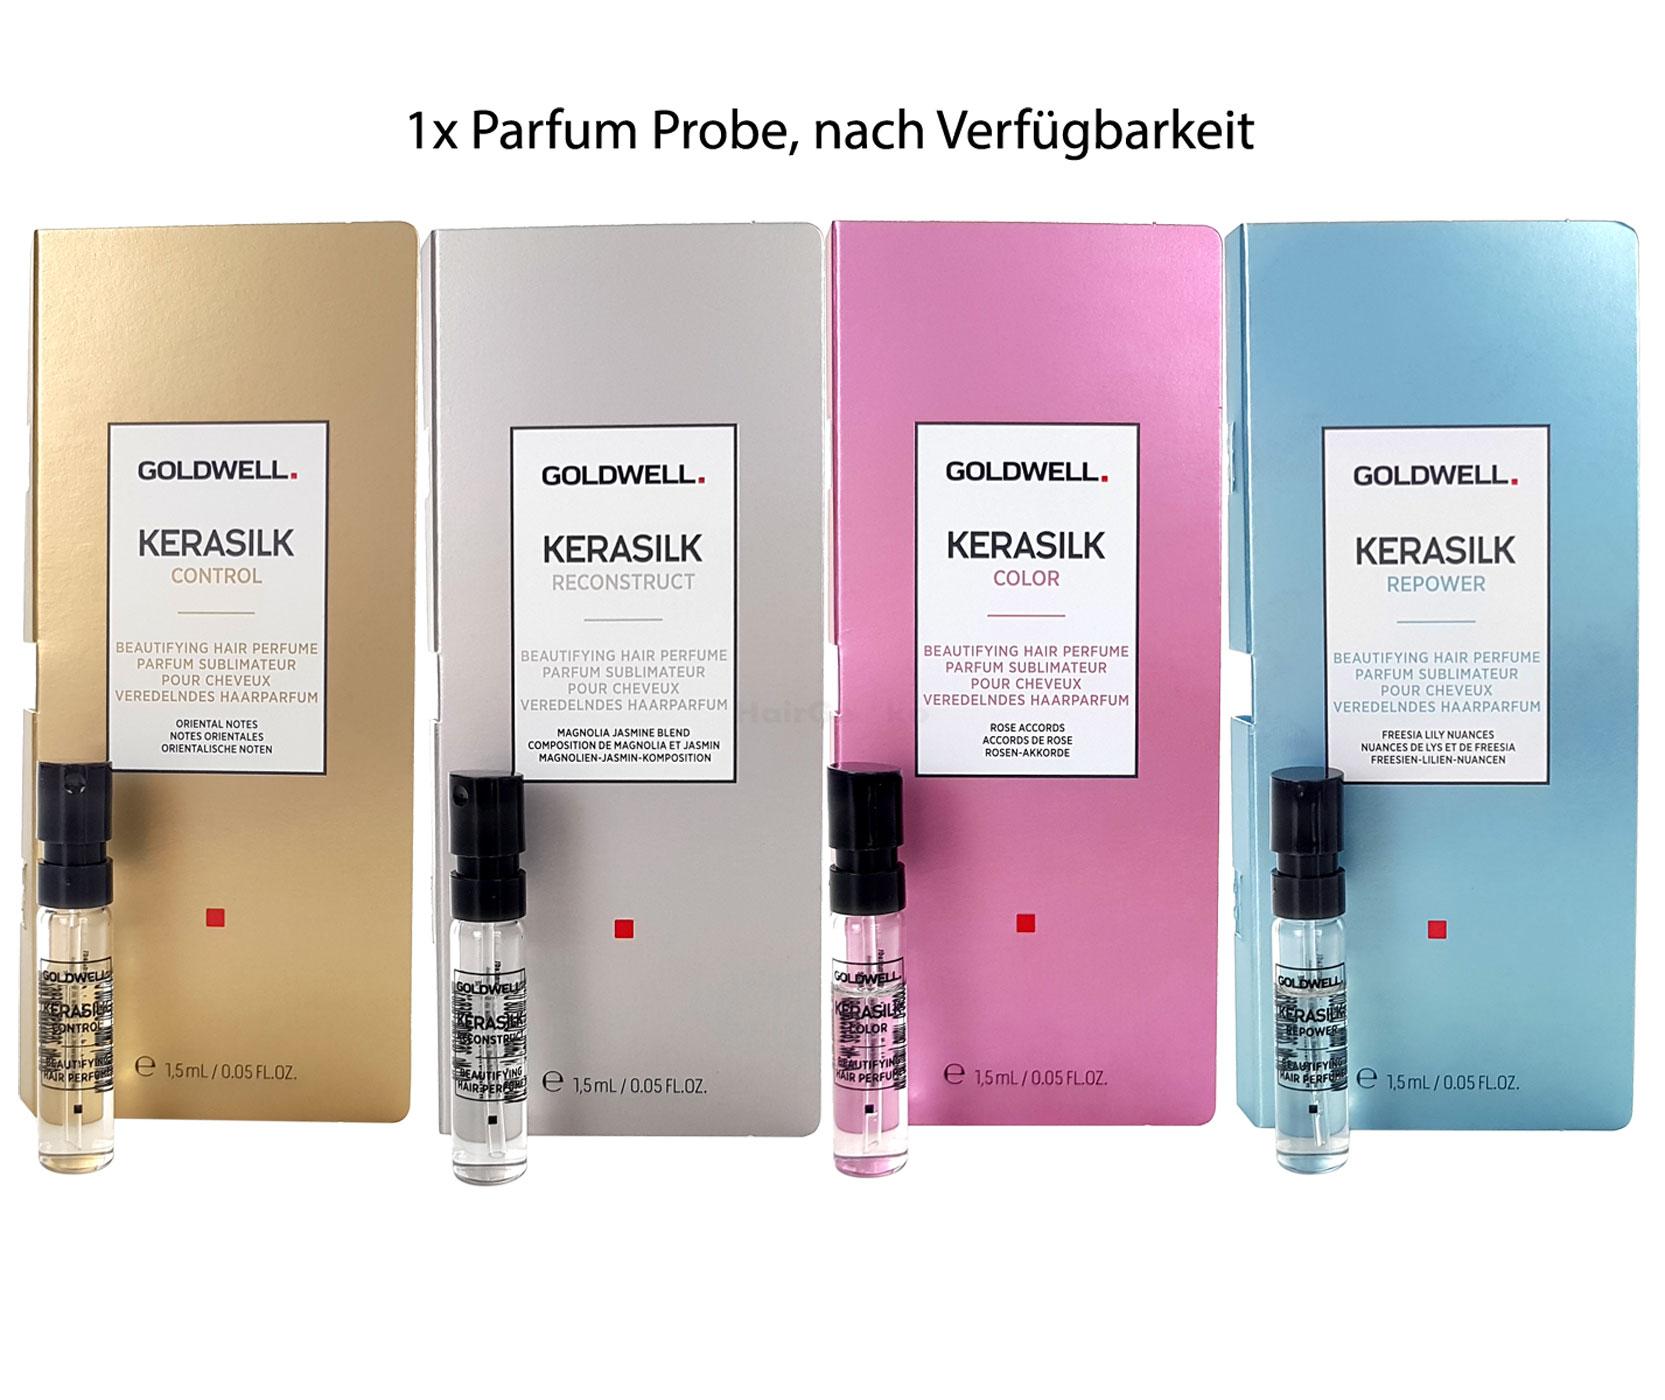 Goldwell Kerasilk Haarparfum Control, Reconstruct, Color, Repower Parfum Probe - 1,5ml